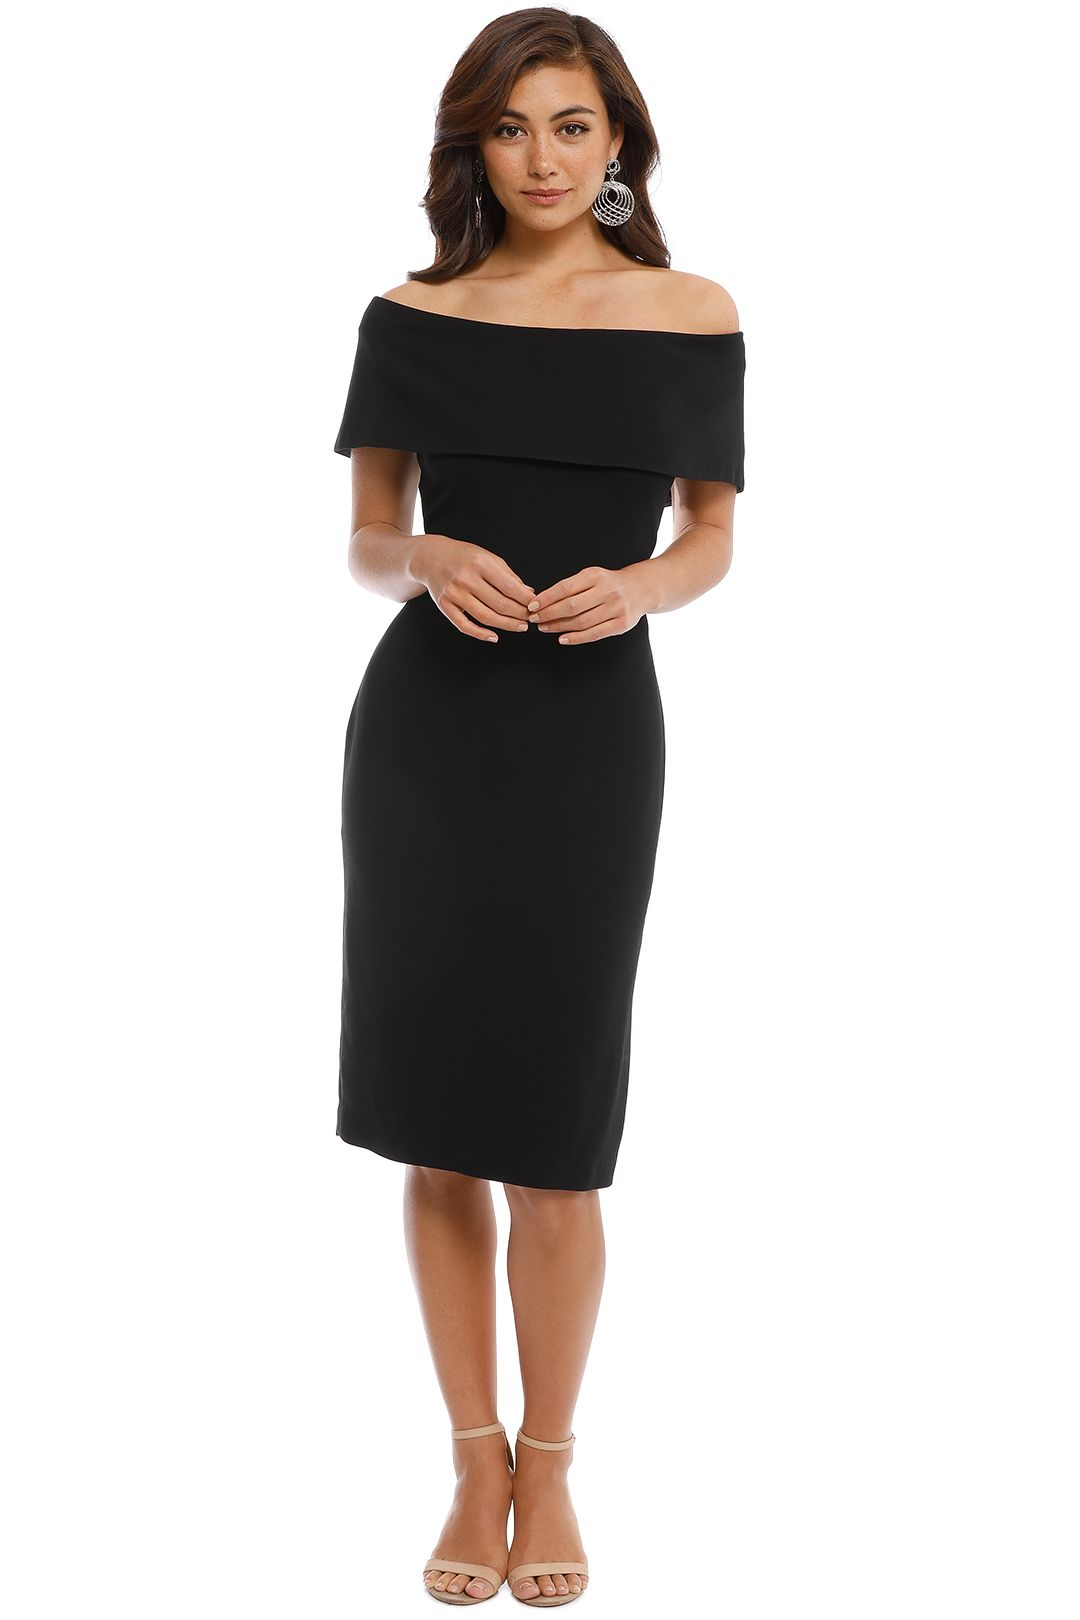 Carla Zampatti - Black Sabrina Sheath Dress - Black - Front